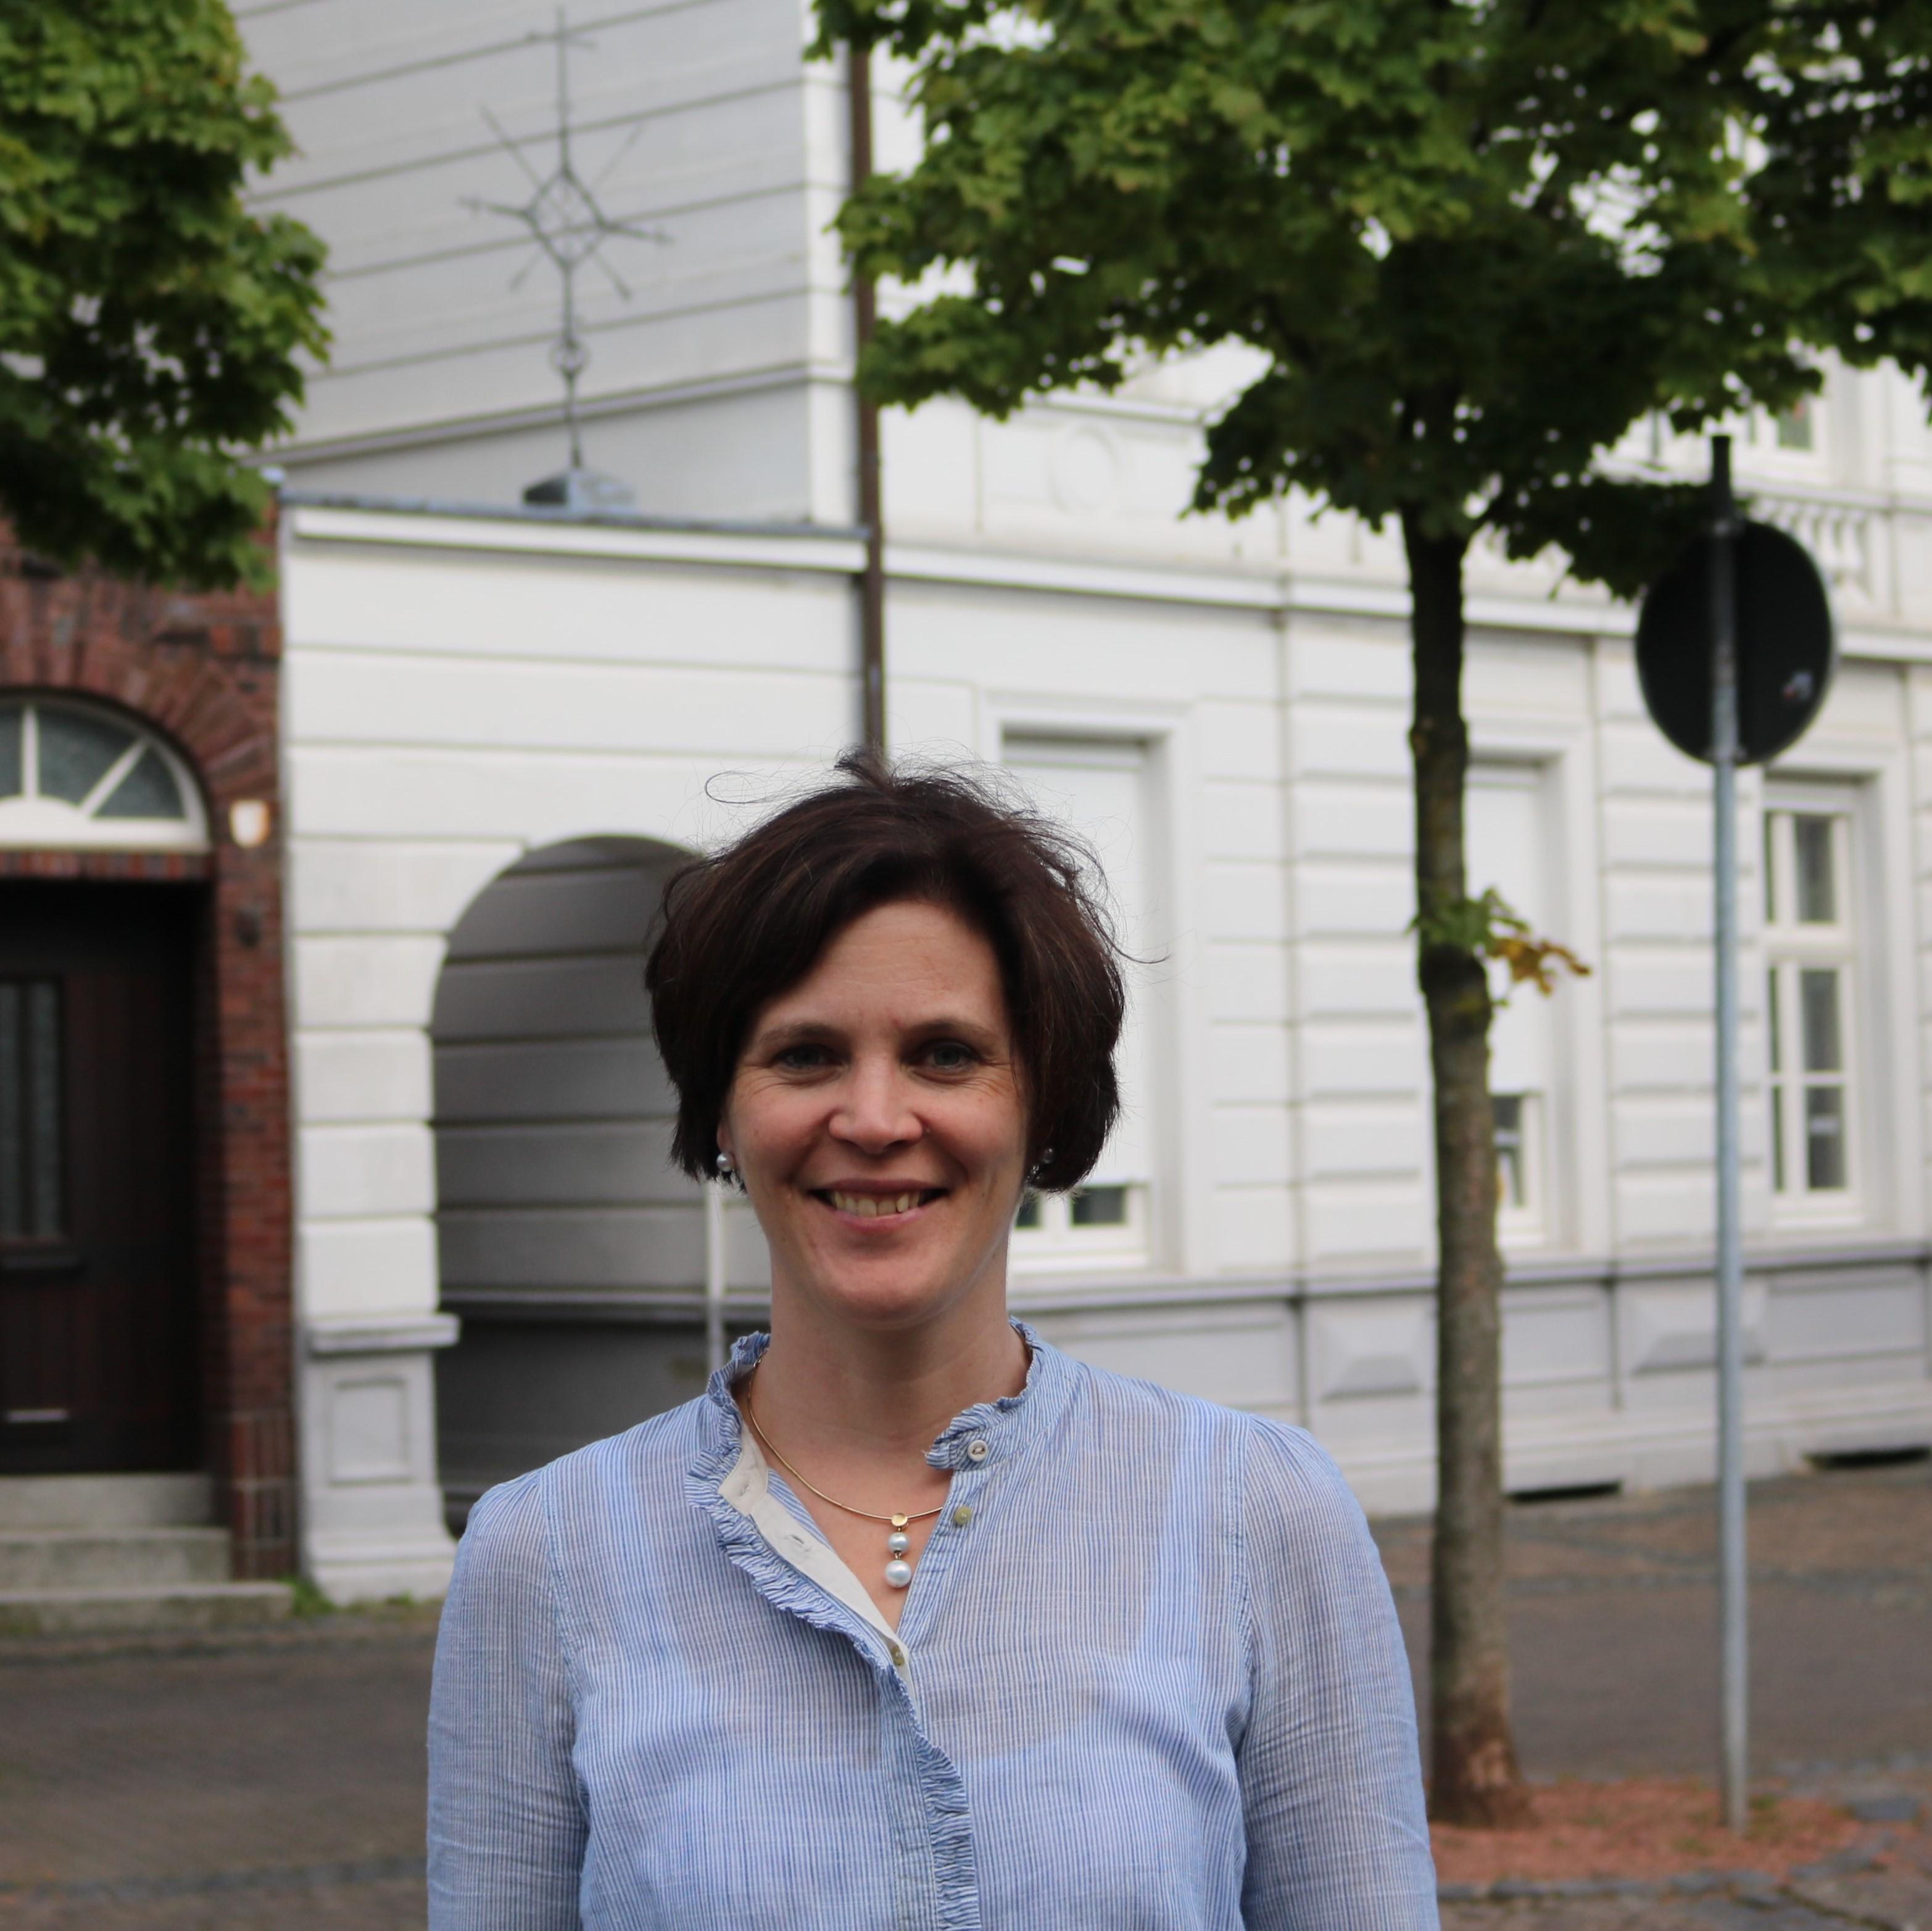 Ellen Wehnen